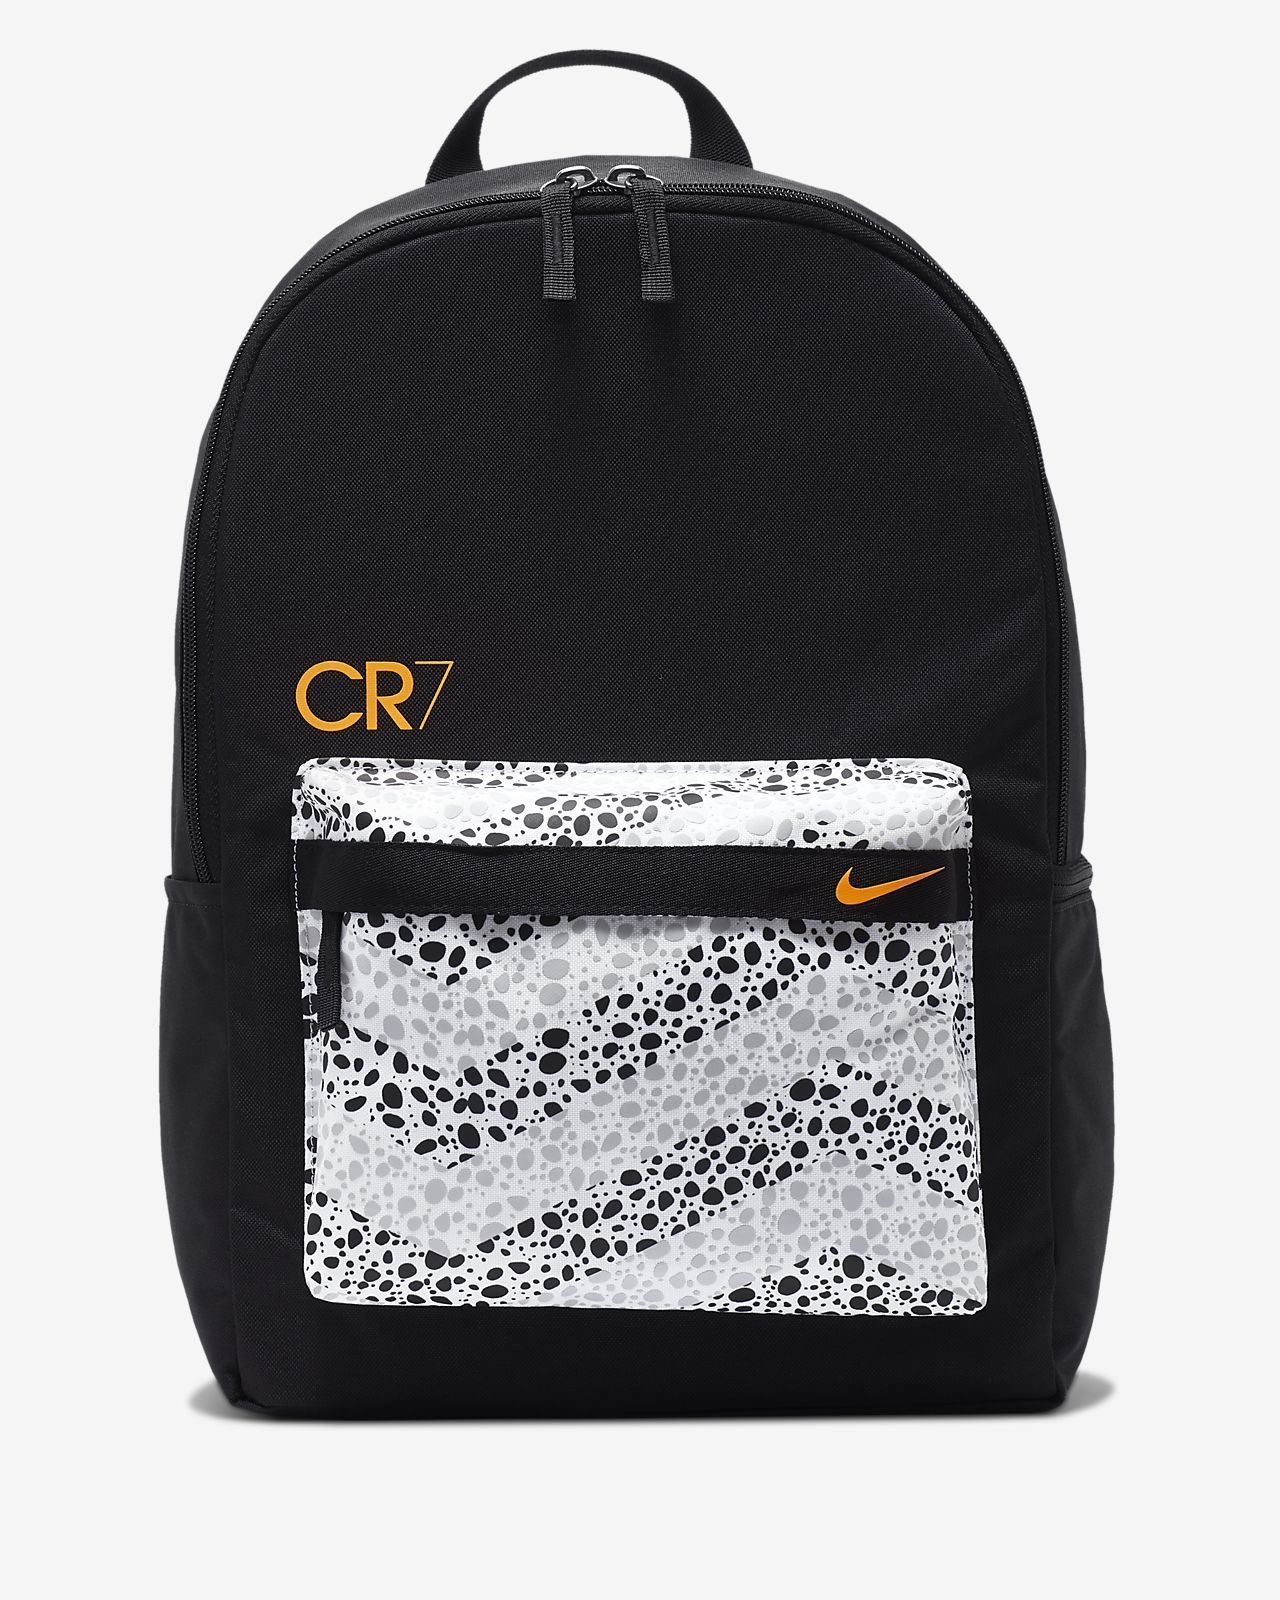 CR7 Kinder Fußballrucksack